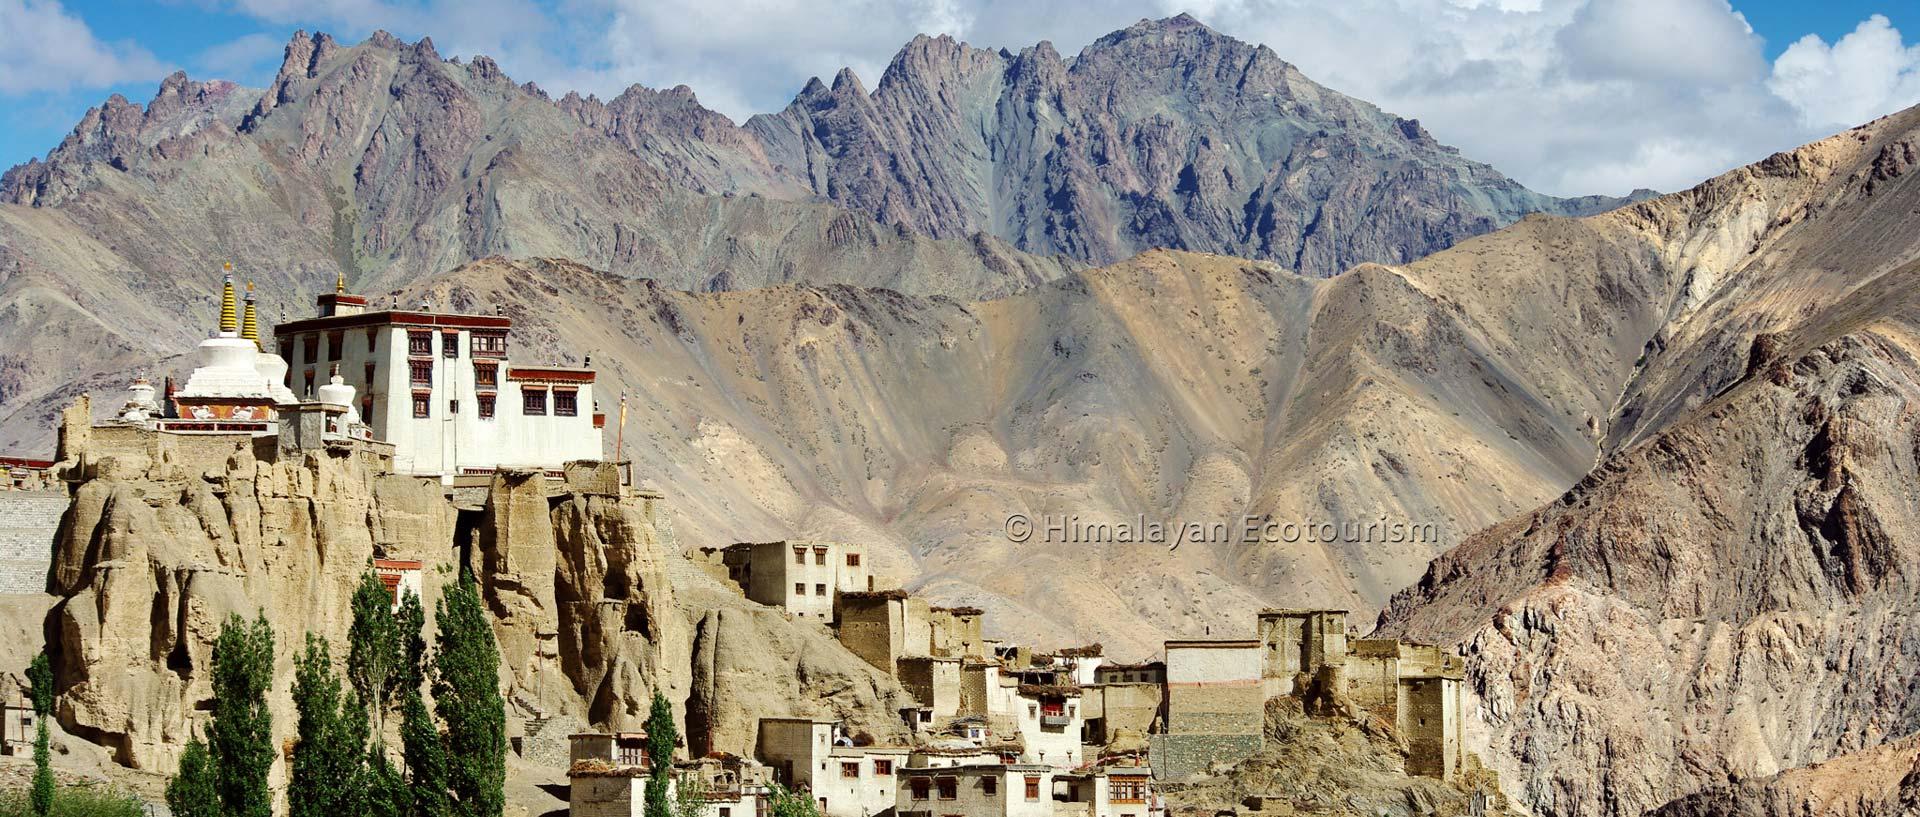 Le monastère de Lamayuru, Ladakh